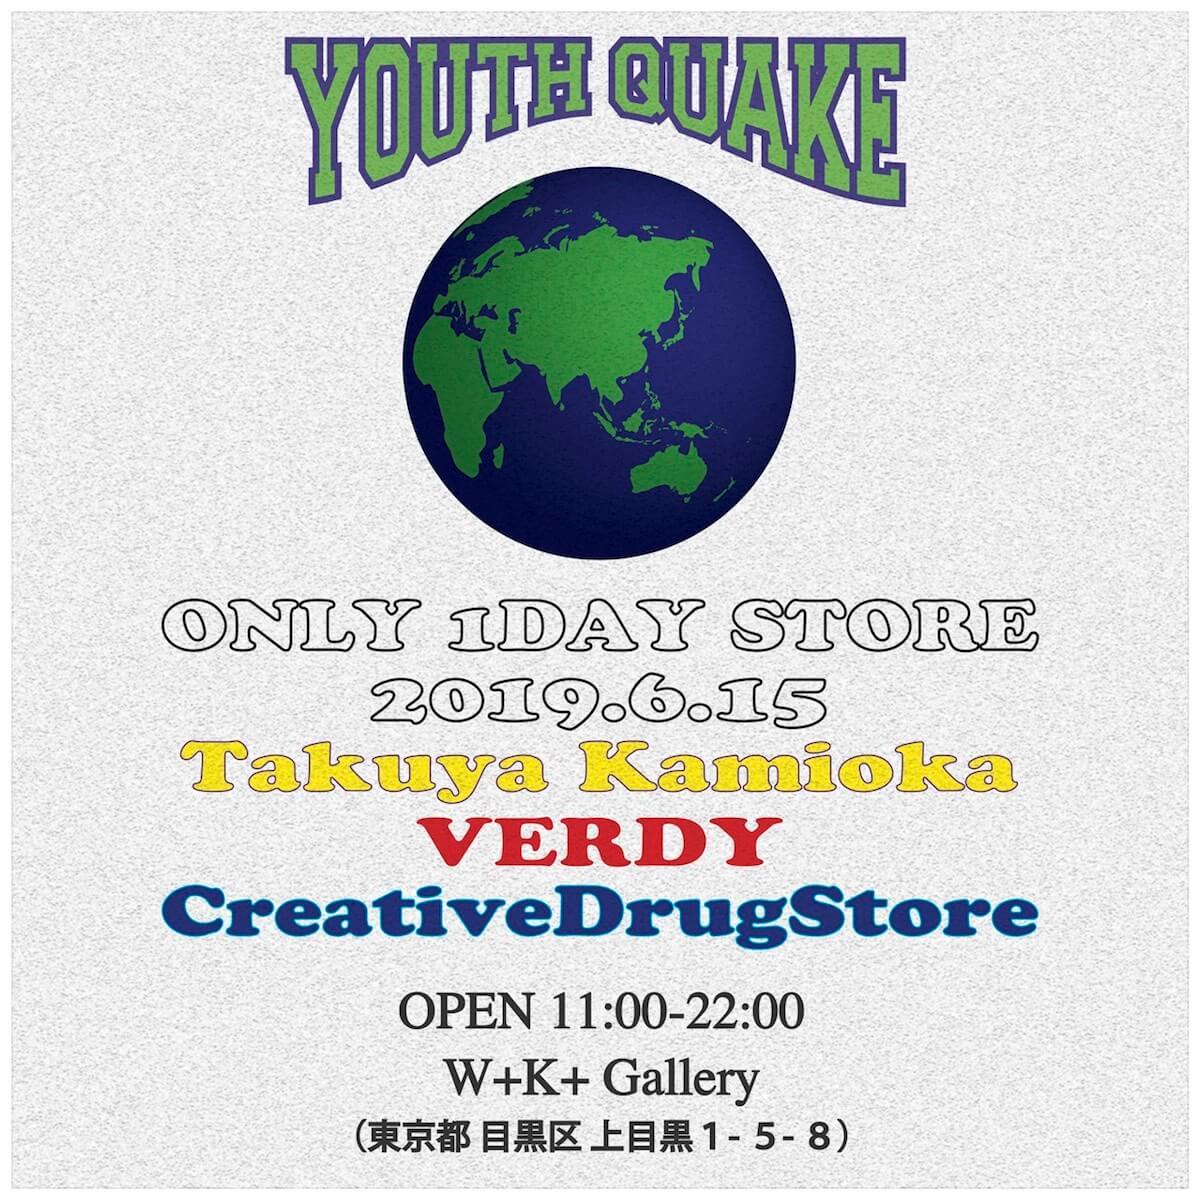 YouthQuakeが1日限りのポップアップショップを開催し、VERDY、CreativeDrugStore、上岡拓也とのコラボTシャツを販売|LookにはDaichi Yamamoto、俳優の藤江琢磨ら life-fashion190611-youth-quake-1